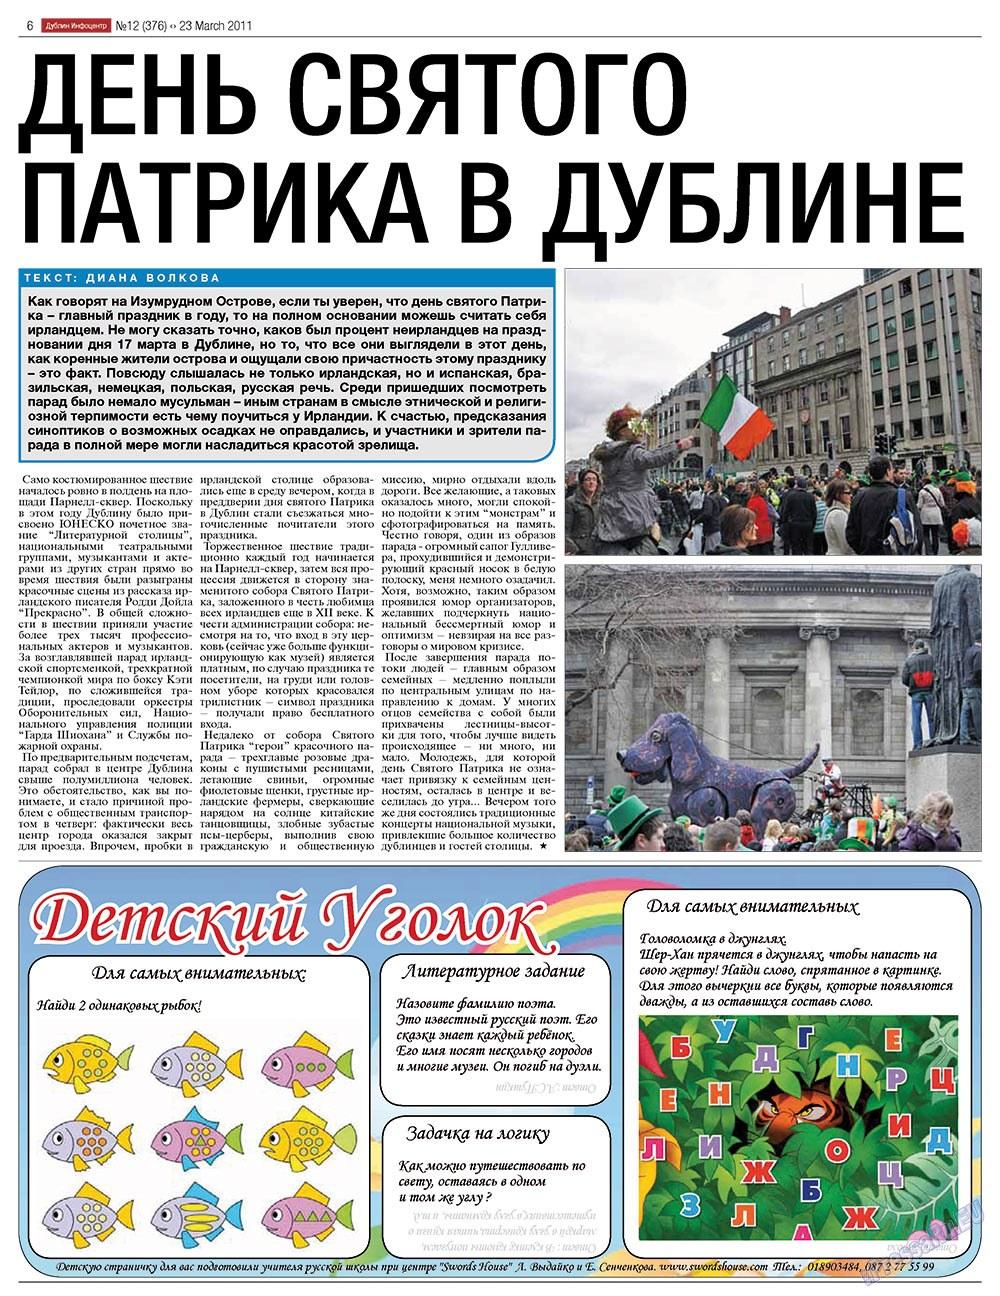 Дублин инфоцентр (газета). 2011 год, номер 12, стр. 6